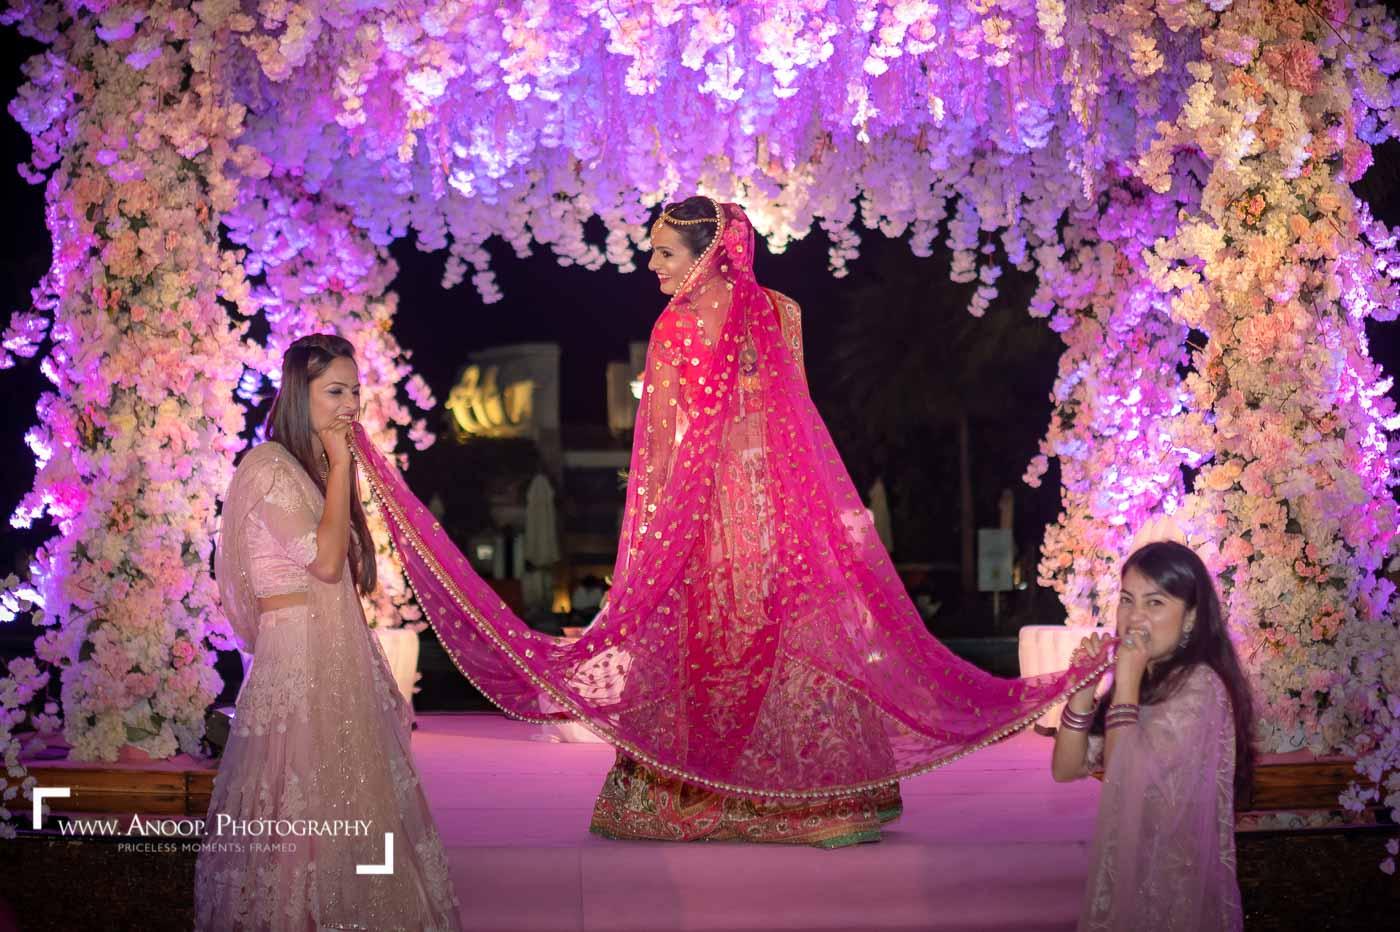 Destination-Nepali-Wedding-in-thailand-sheraton-hua-hin-013